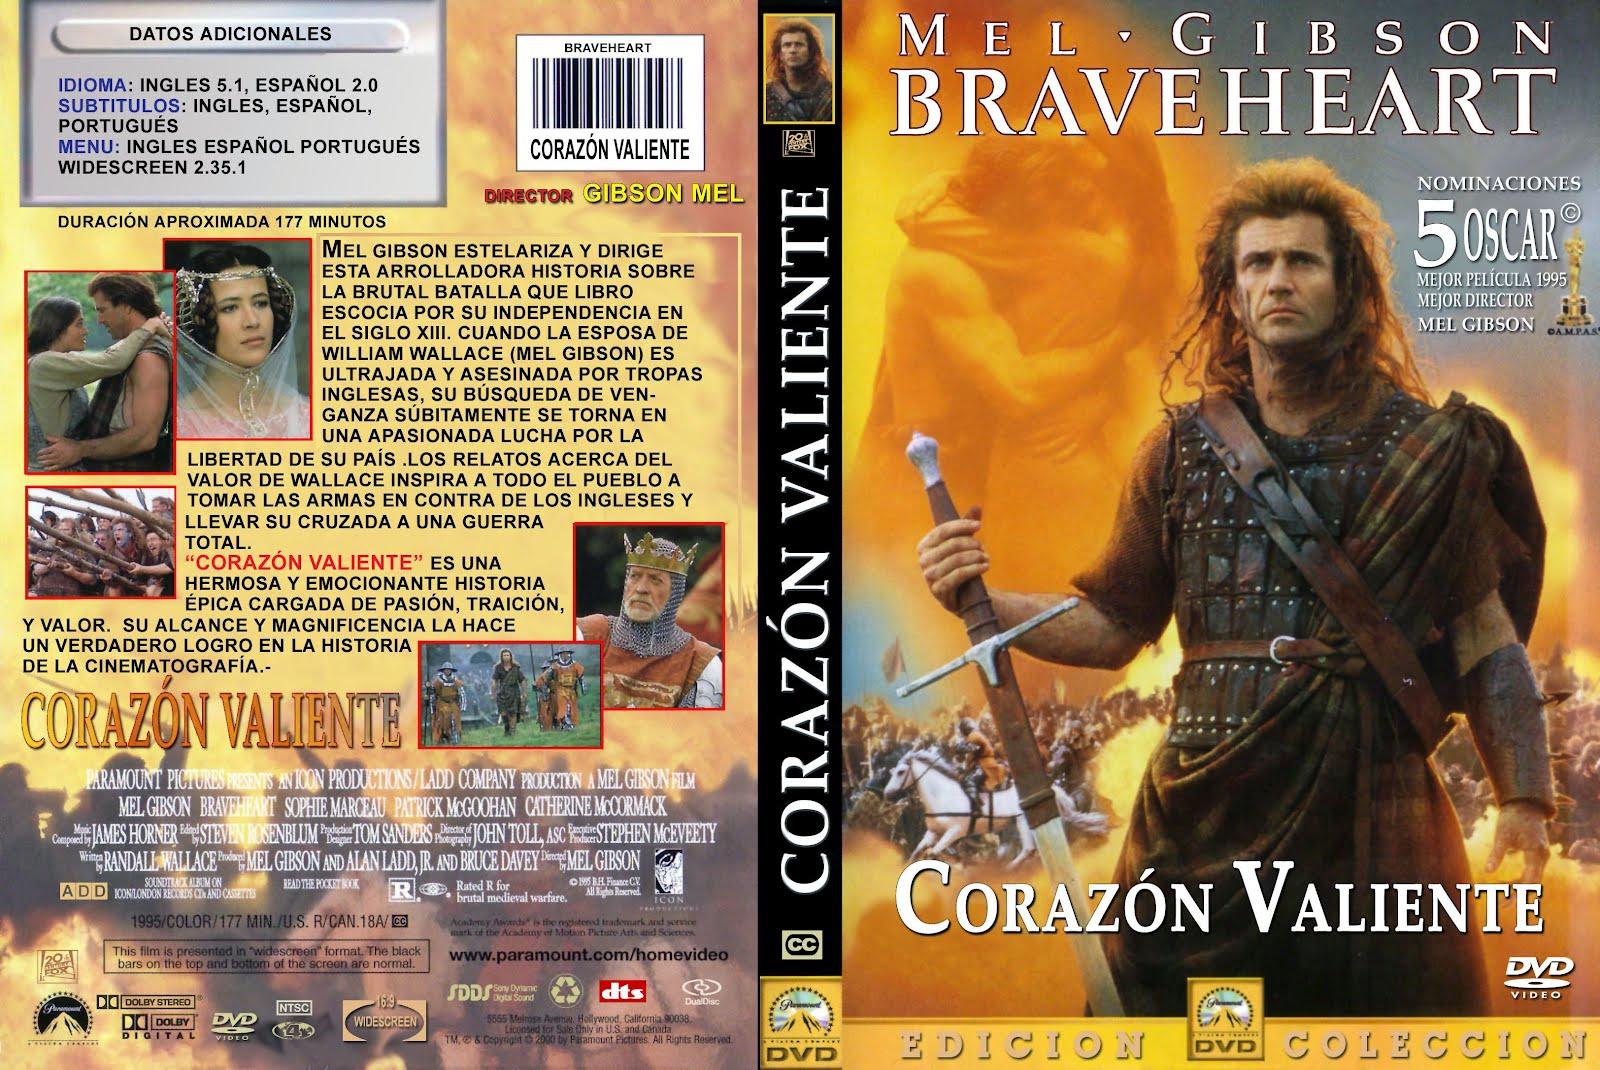 Corazon valiente braveheart 1995 dvdfull pl identi Corazon valiente pelicula